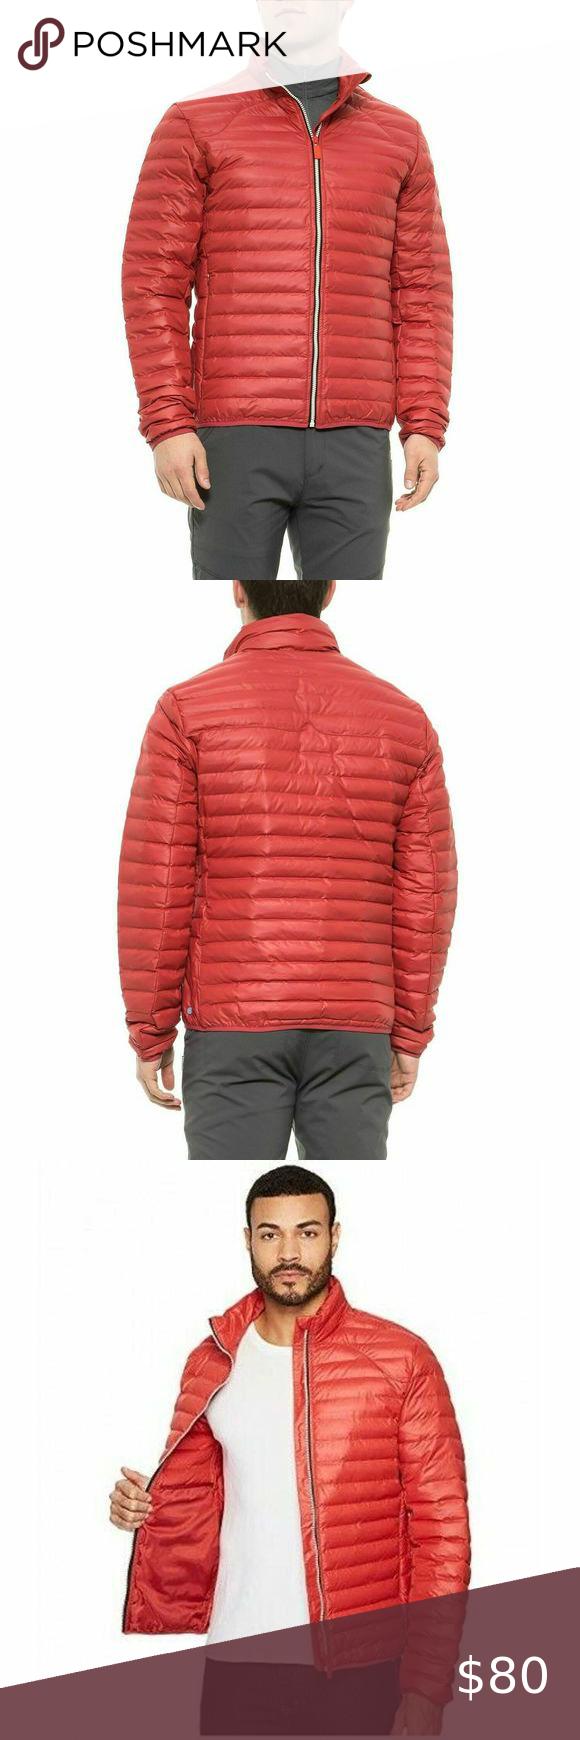 Hunter Midlayer Insulated Puffer Jacket M Jackets Black Puffer Jacket Puffer Jackets [ 1740 x 580 Pixel ]